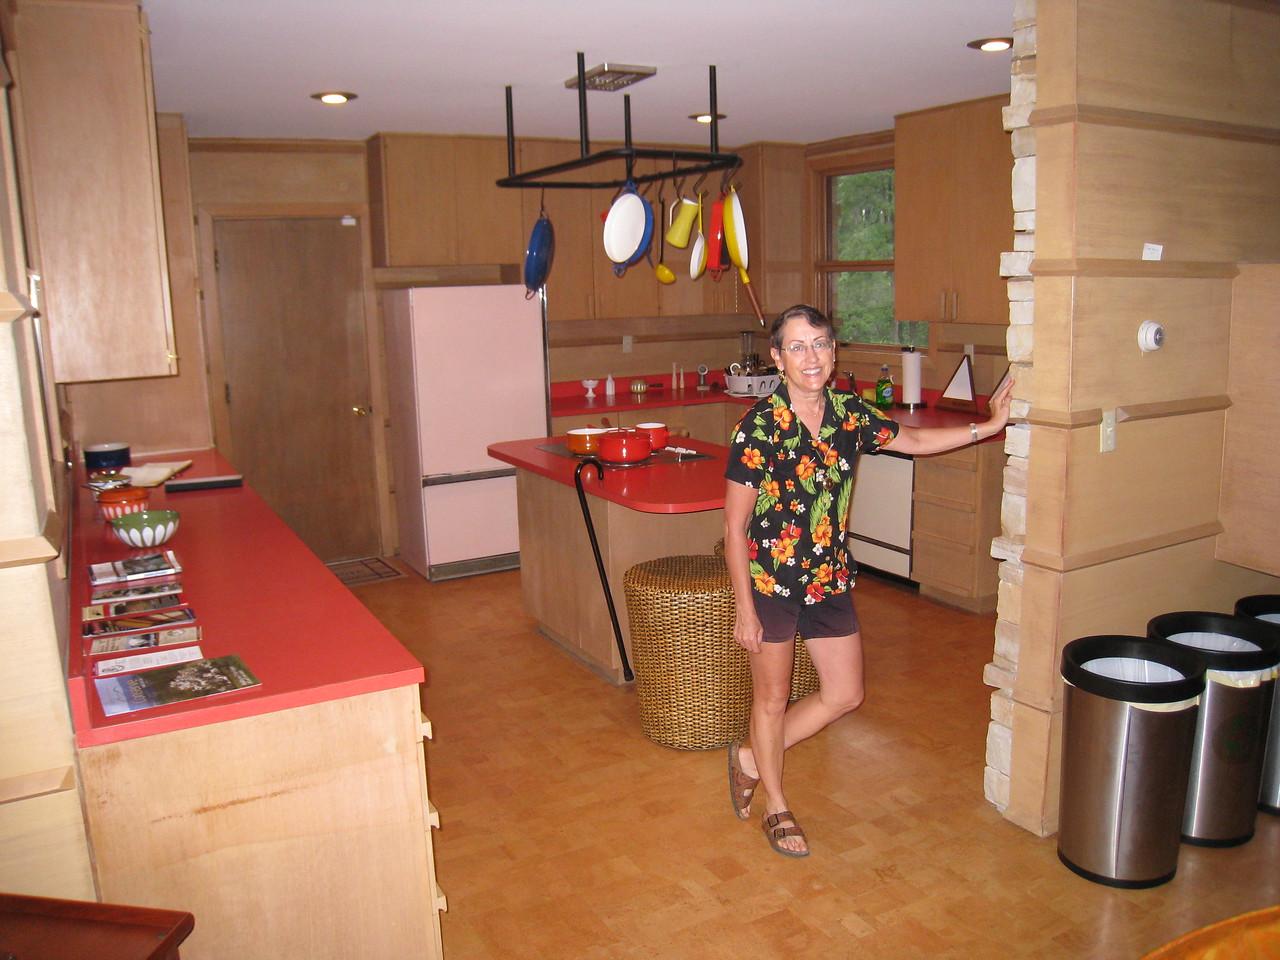 Duncan House kitchen